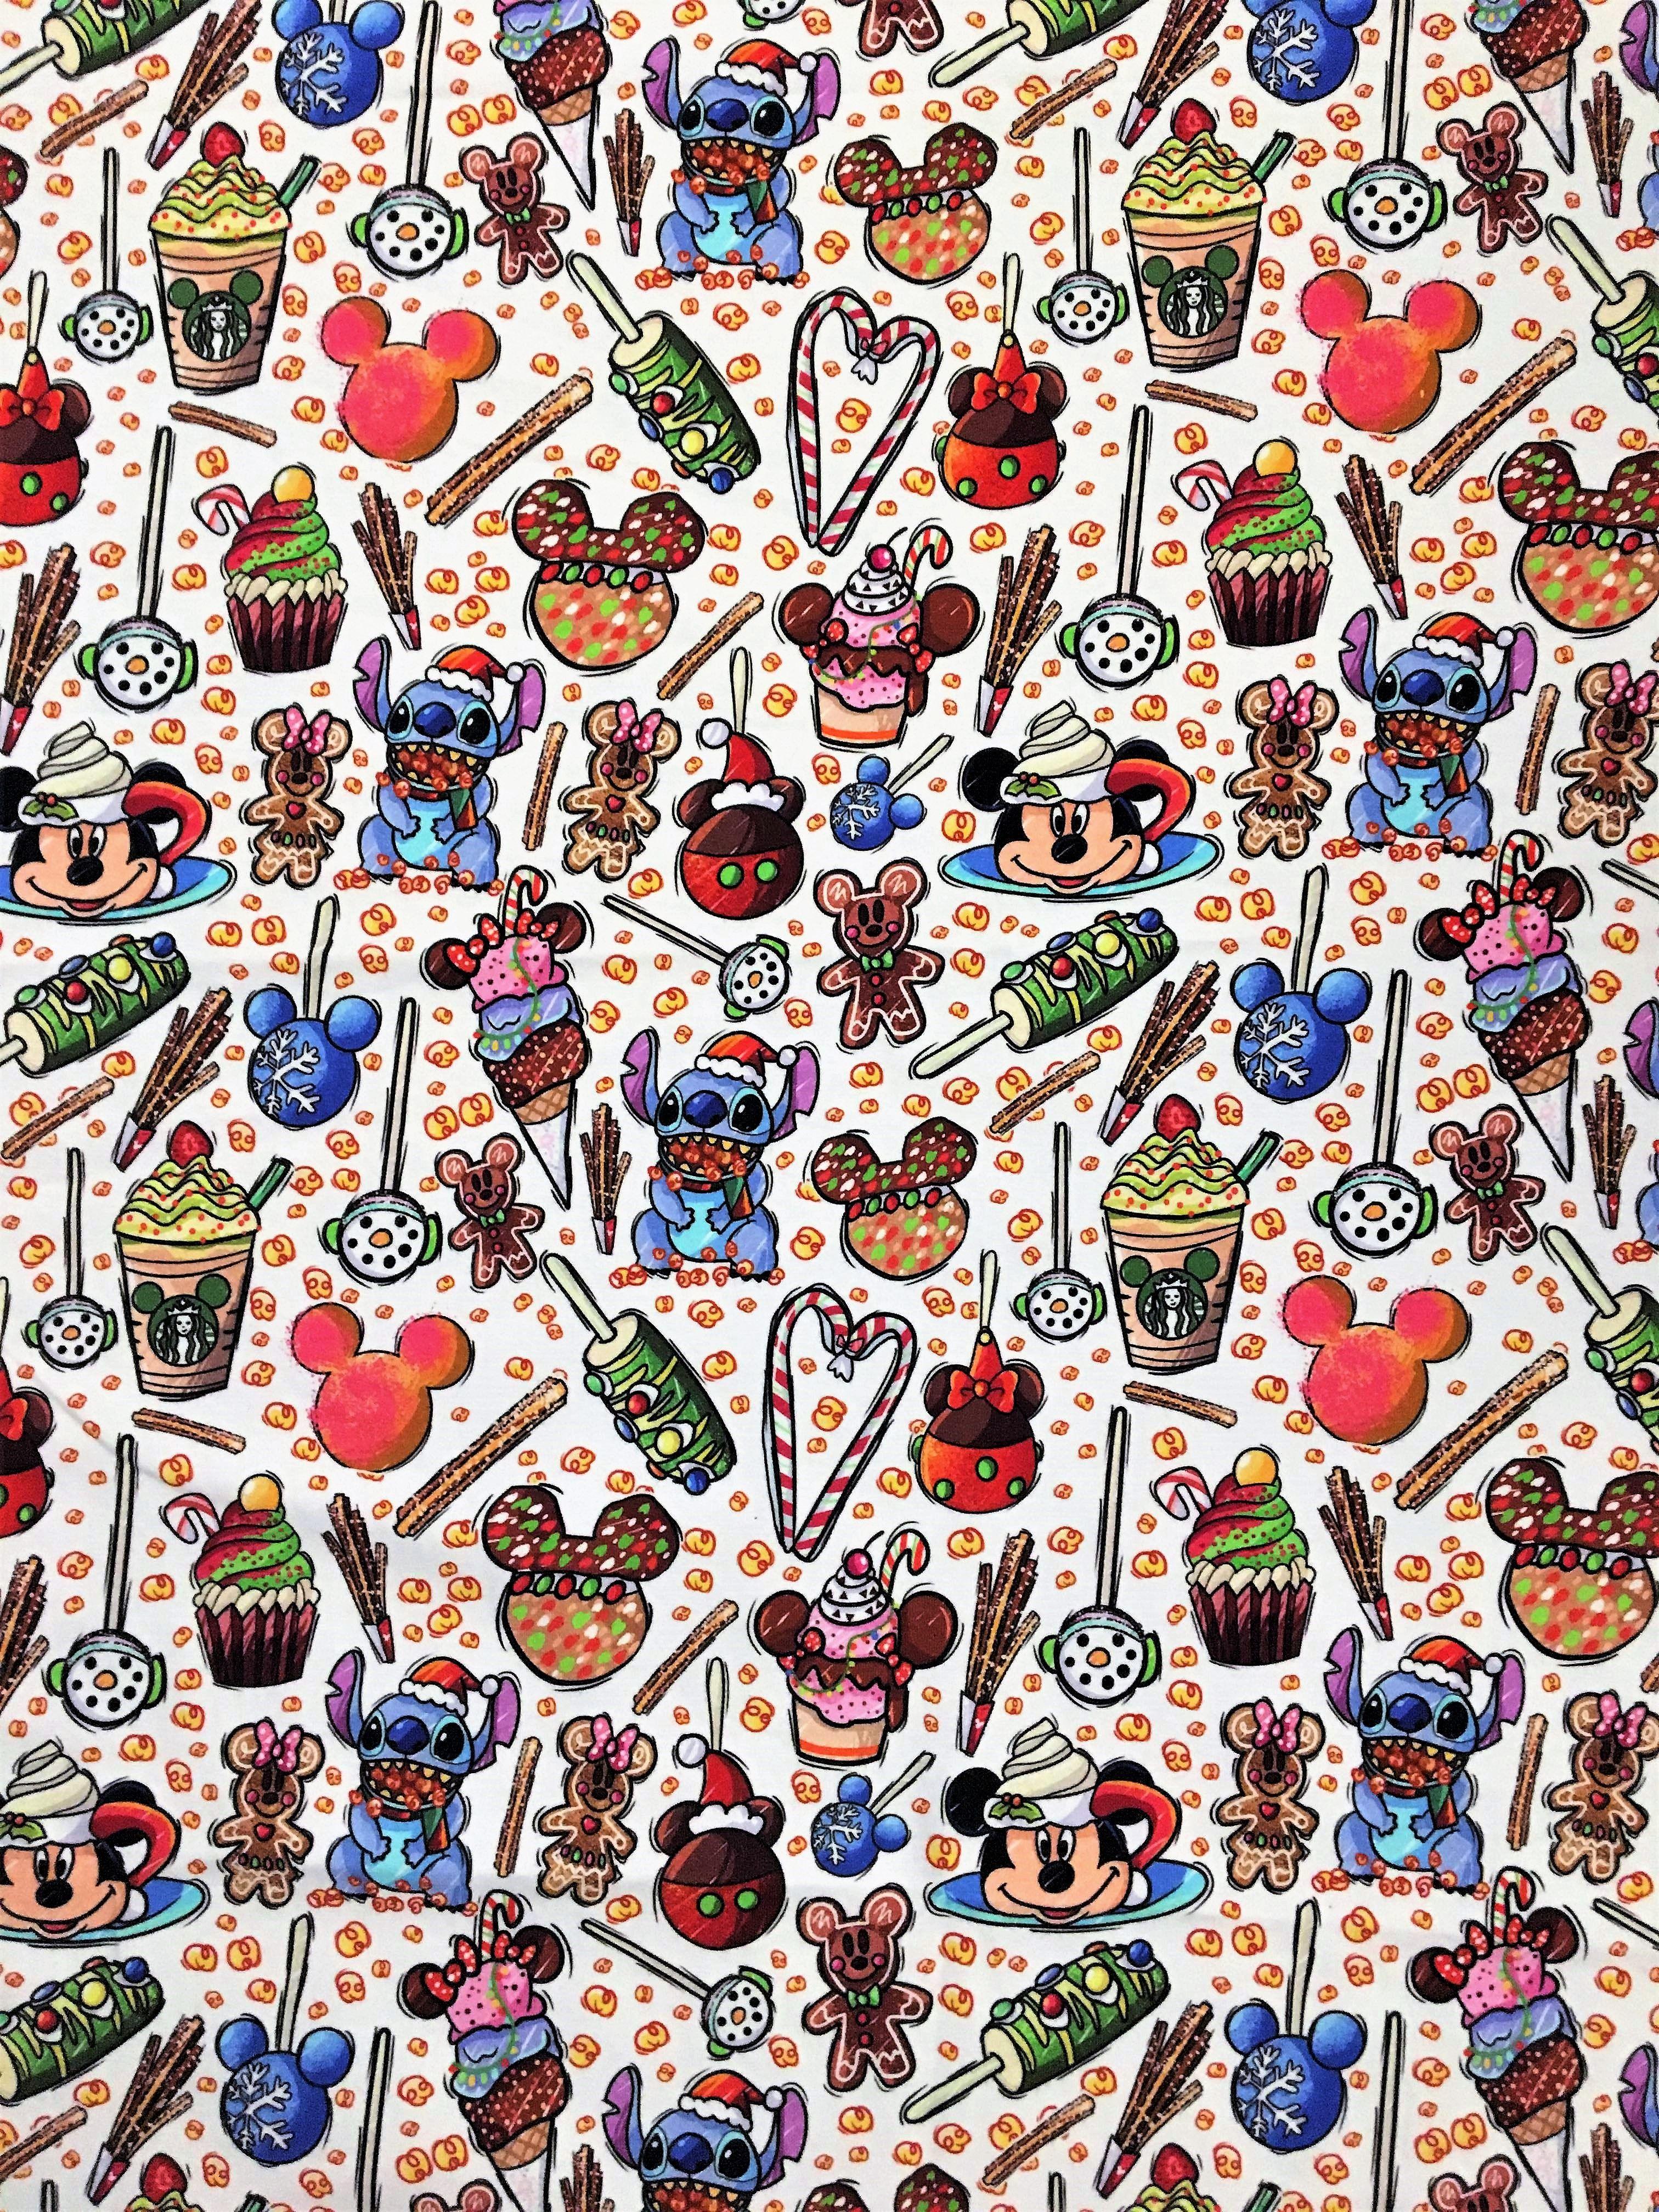 Disney Christmas Wallpaper Fabric Wallpaper Iphone Disney Disney Characters Wallpaper Disney Background